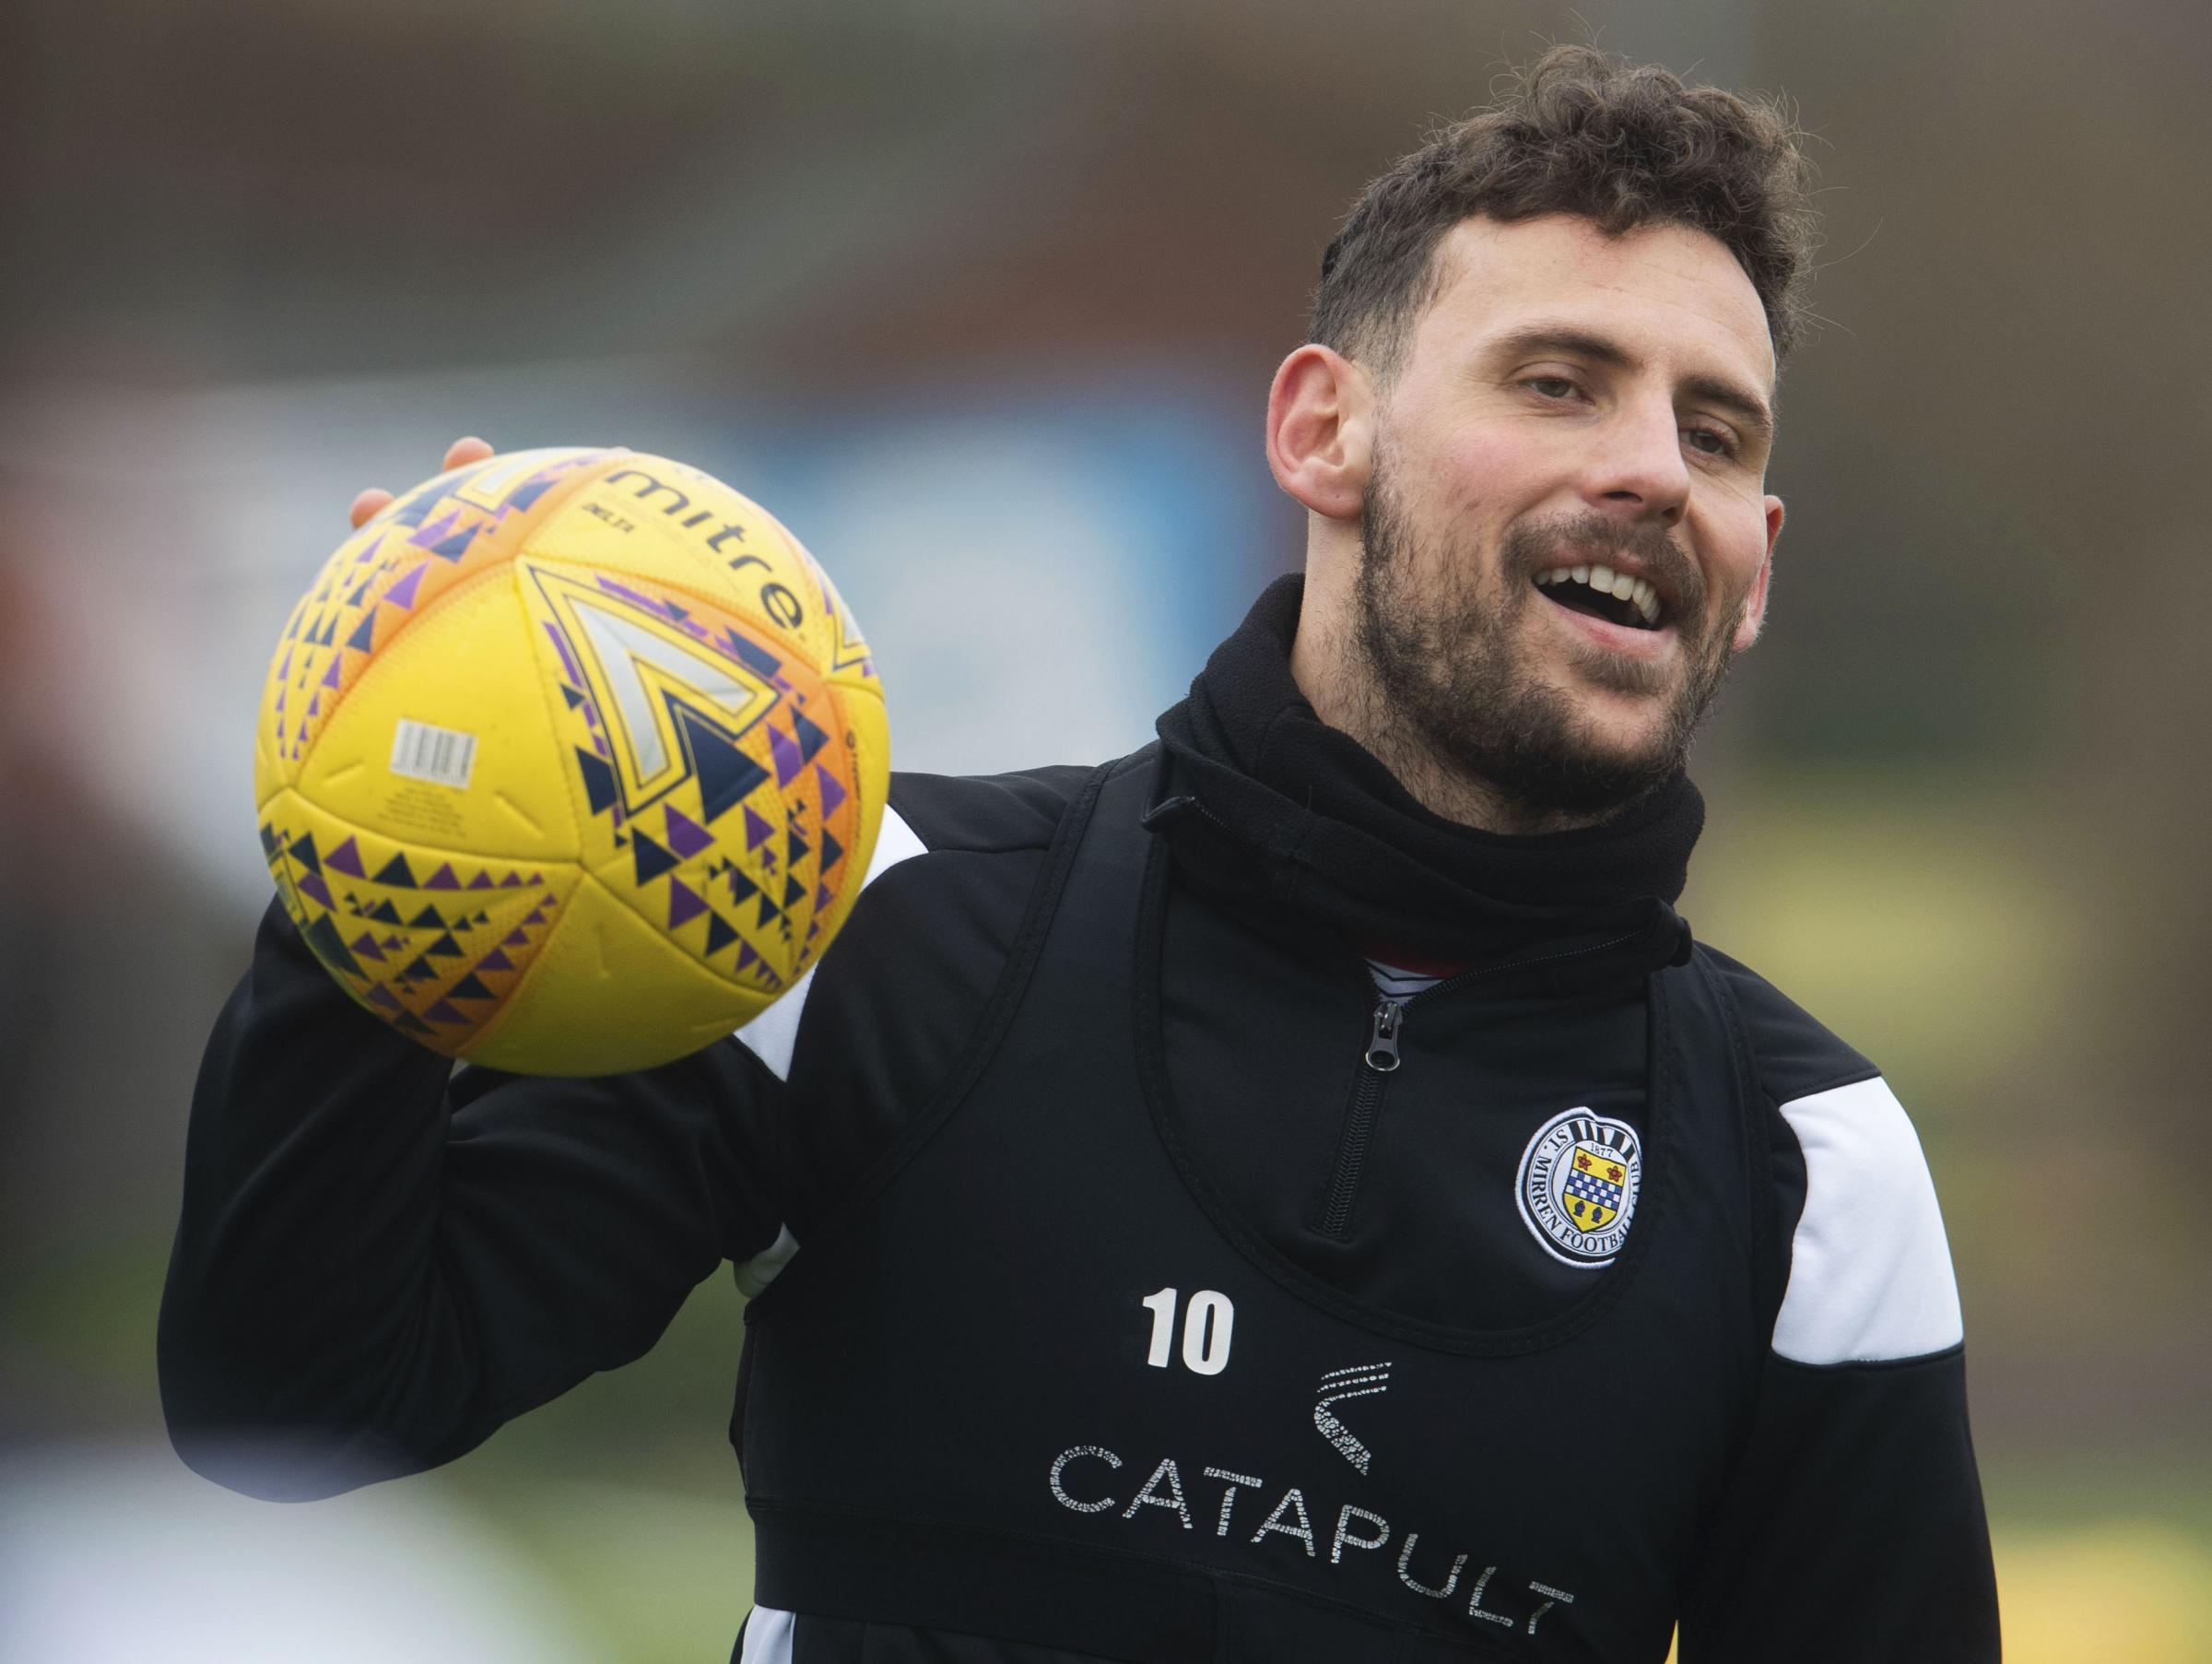 Ross County sign former Hamilton and St Mirren midfielder Tony Andreu